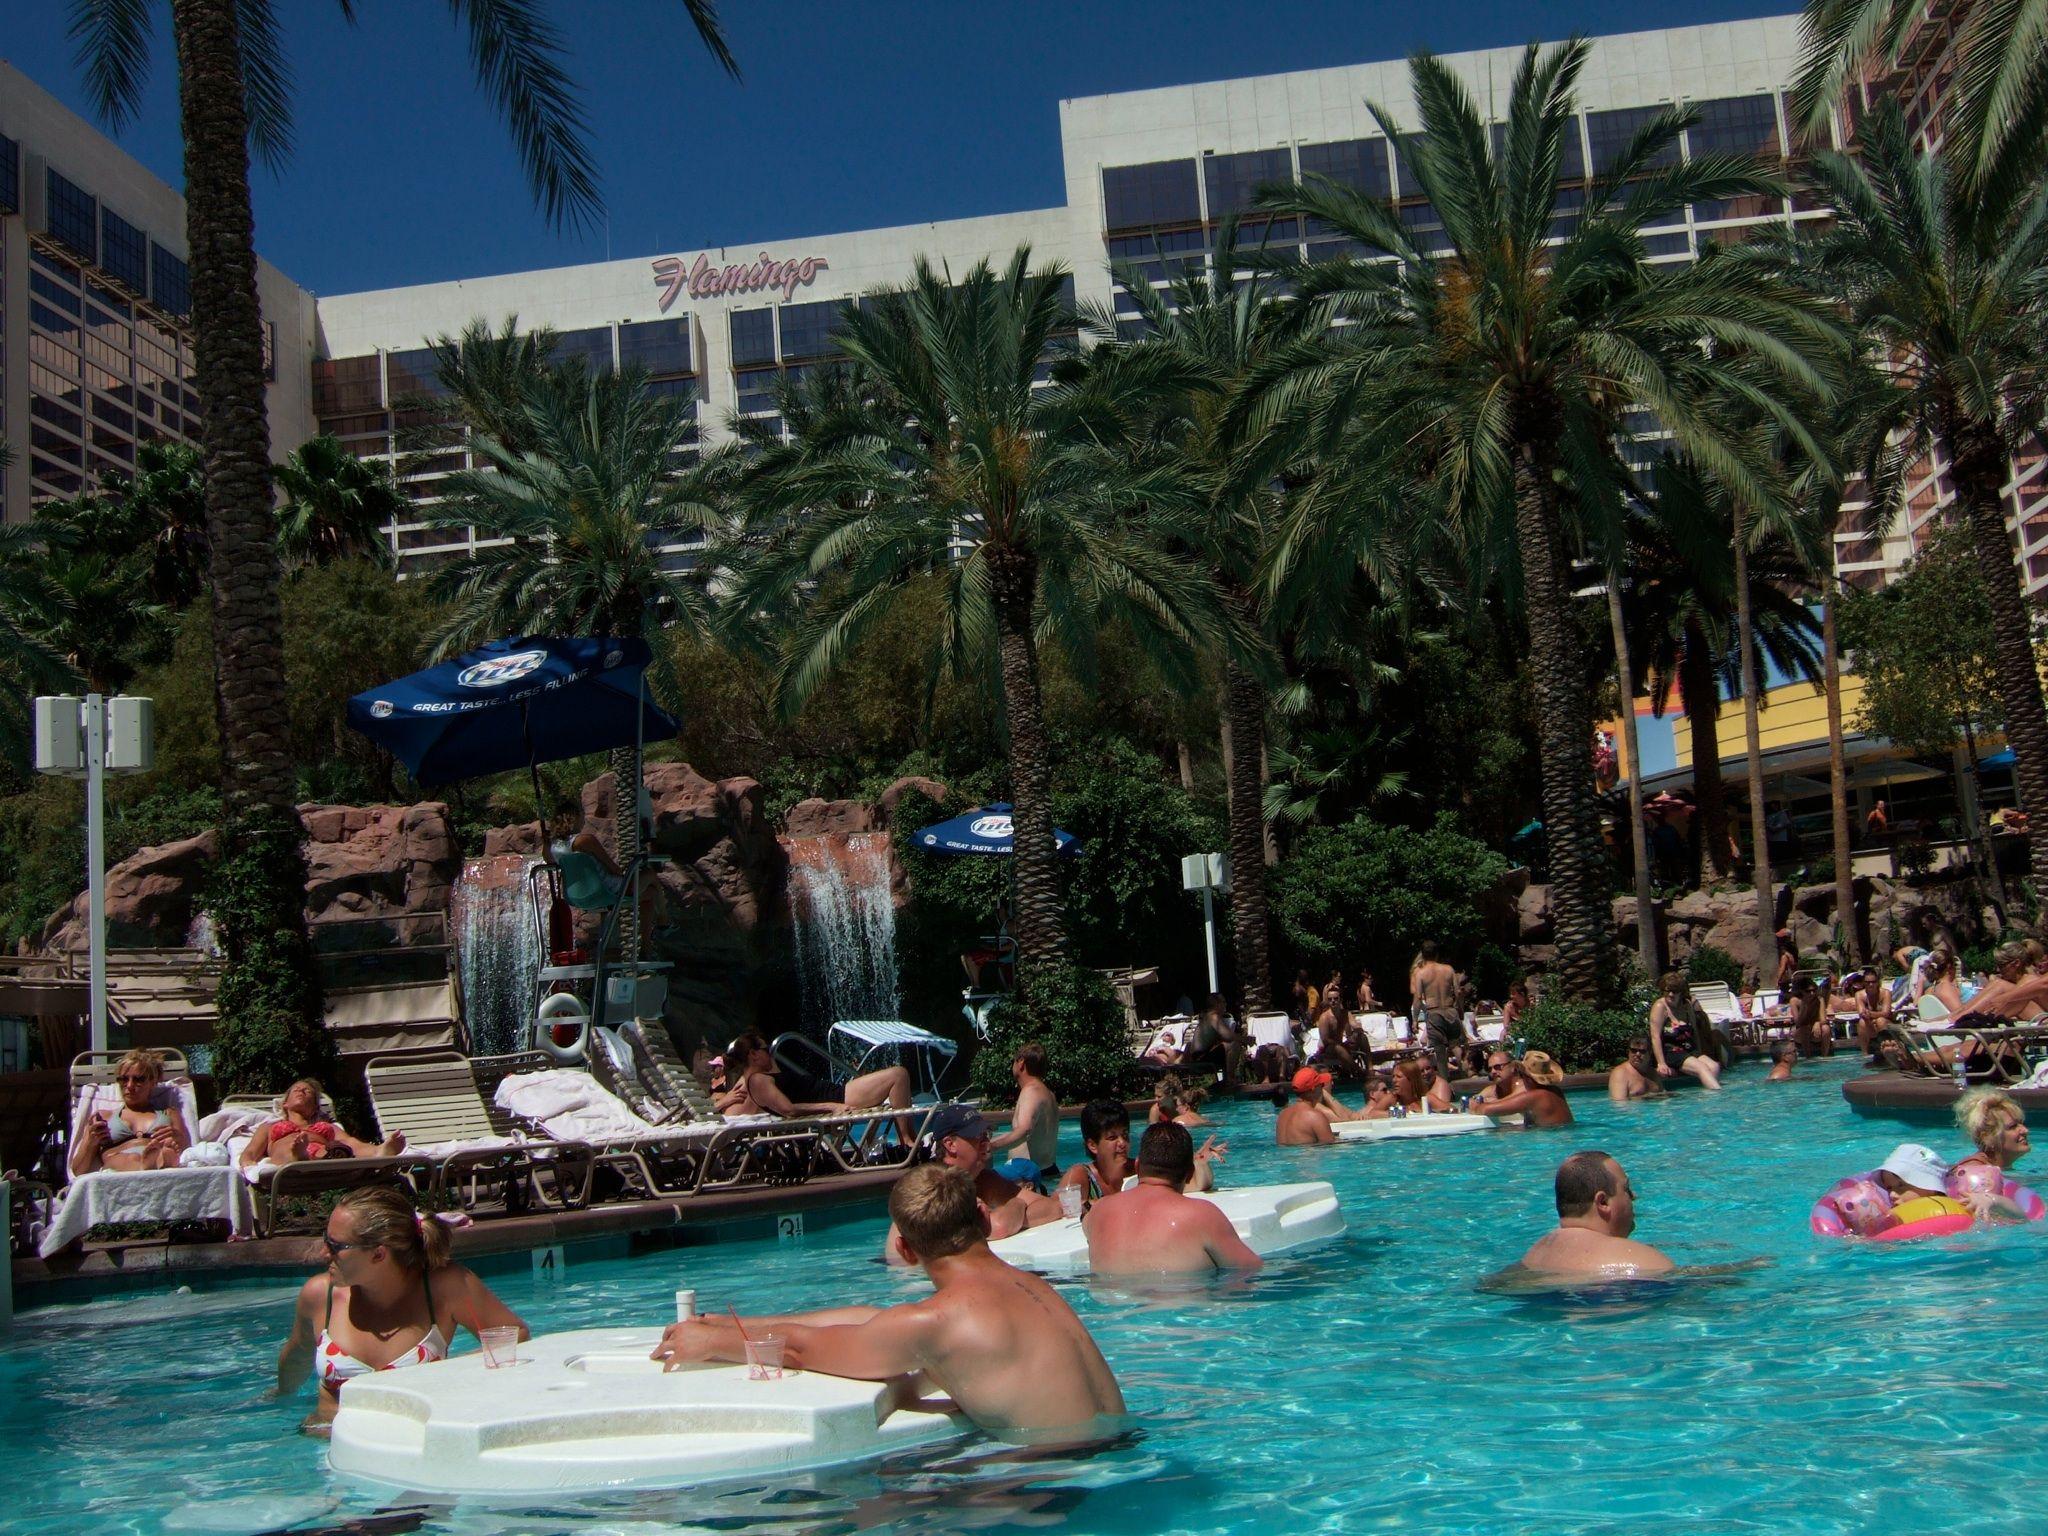 Flamingo Go Pool Las Vegas Flamingo go pool, Vegas baby